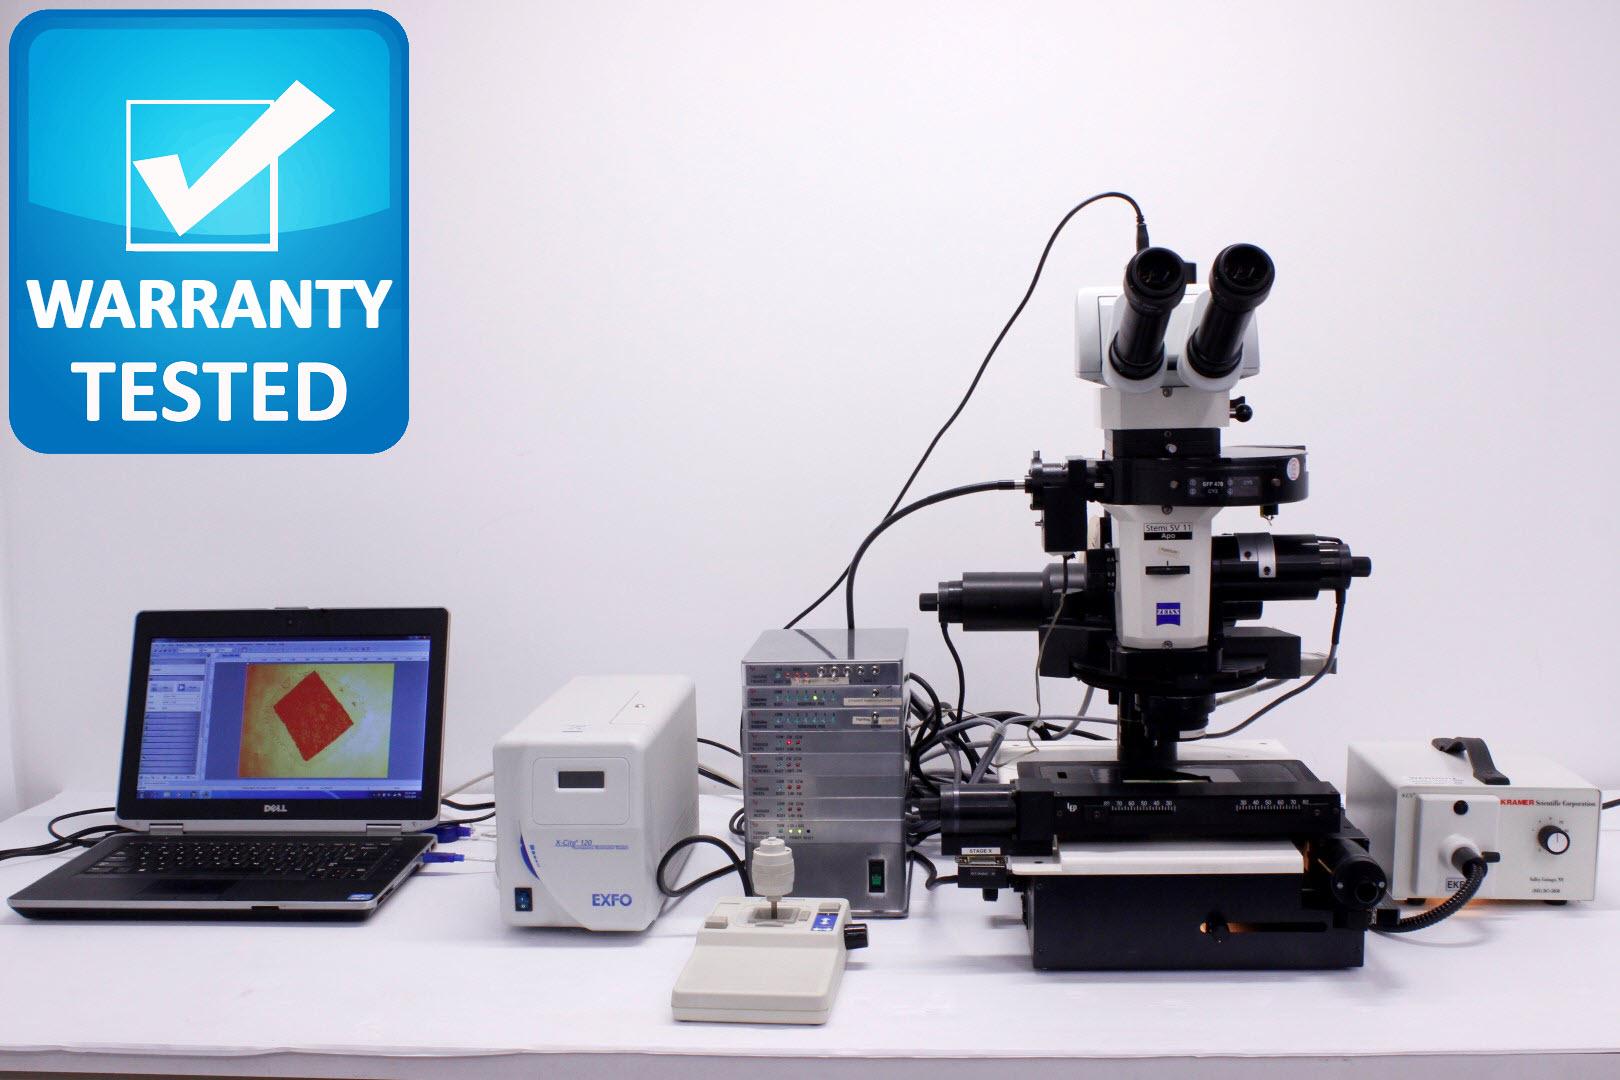 Zeiss Stemi SV 11 Apo Stereo Motorized Fluorescence Microscope